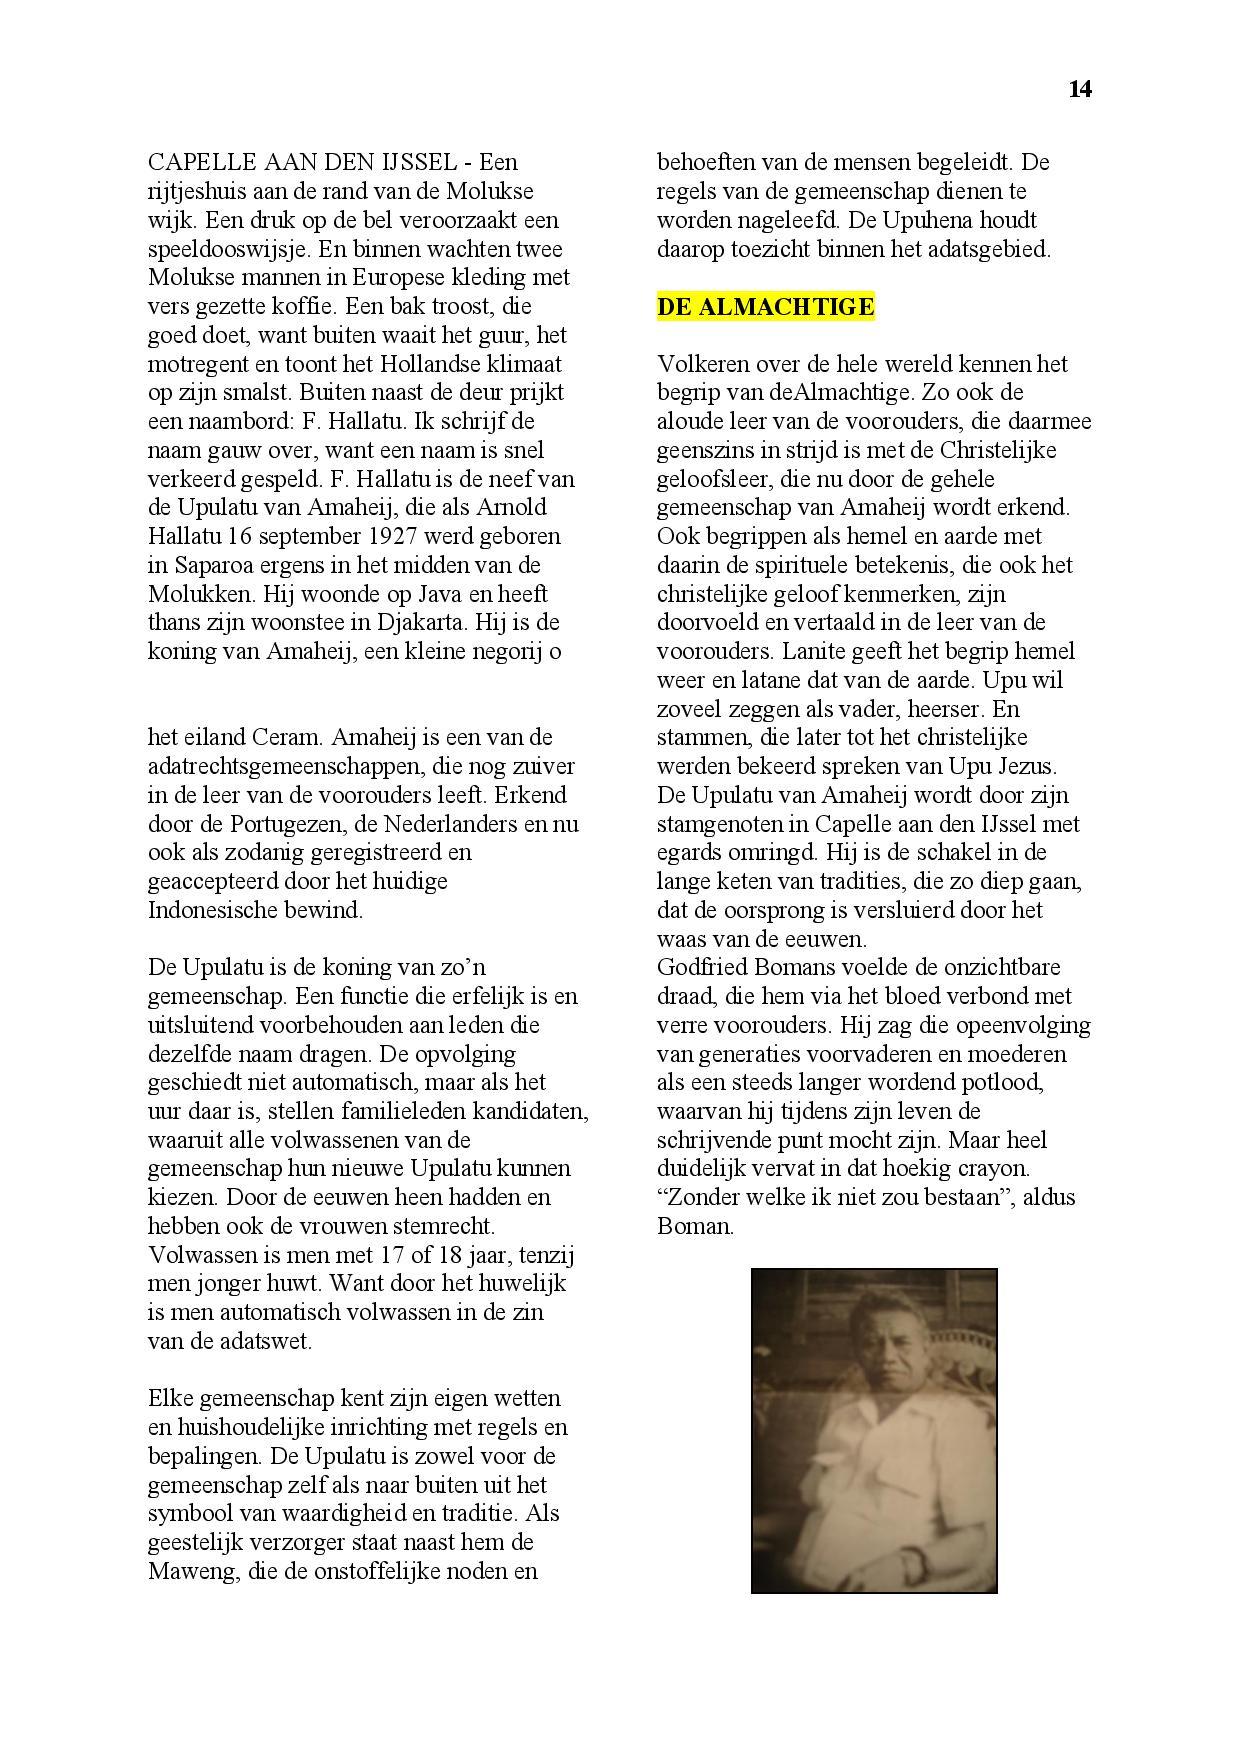 Saka Mese 3e jaargang nr. 02-2007 definitieve webversie-page-014